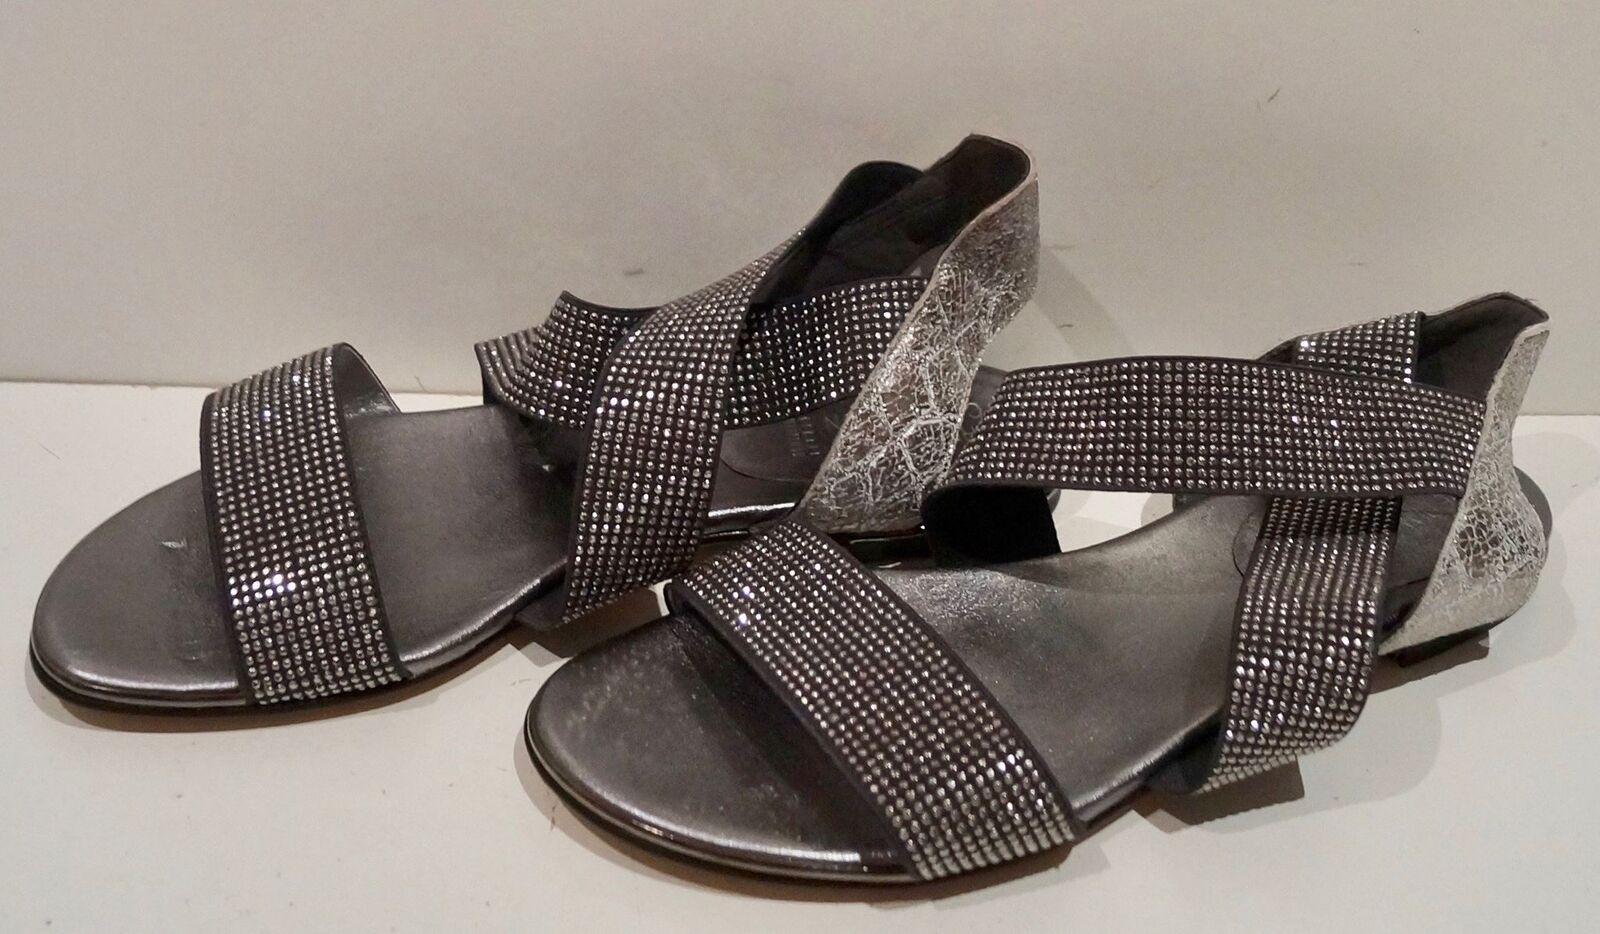 DIAMOND COLLECTION STUART WEITZMAN Silver Grey Diamante Strappy Flat Sandals 5.5